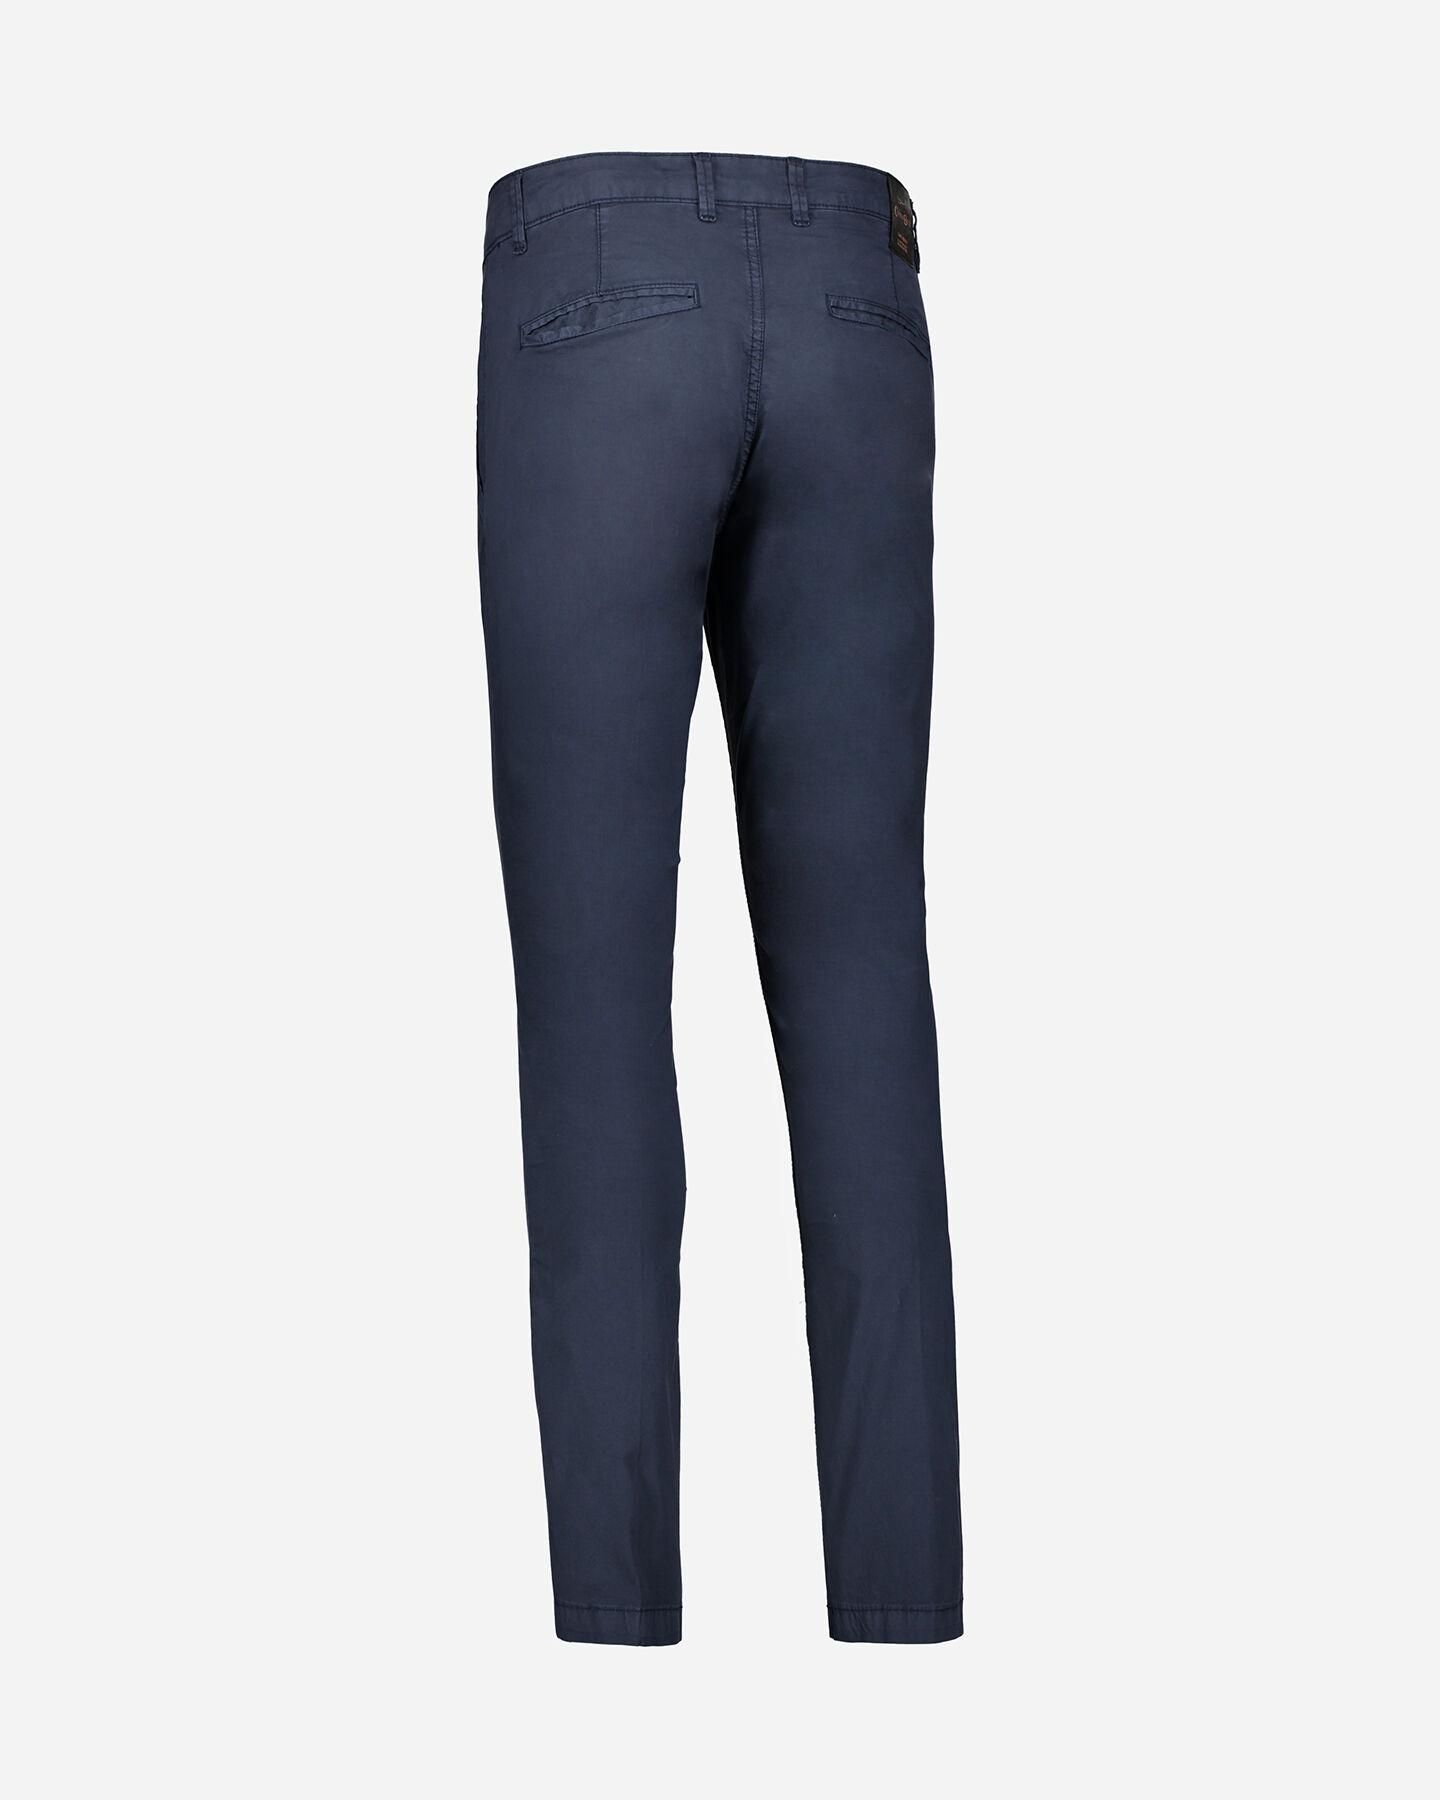 Pantalone COTTON BELT CHINO SLIM M S4065095 scatto 2